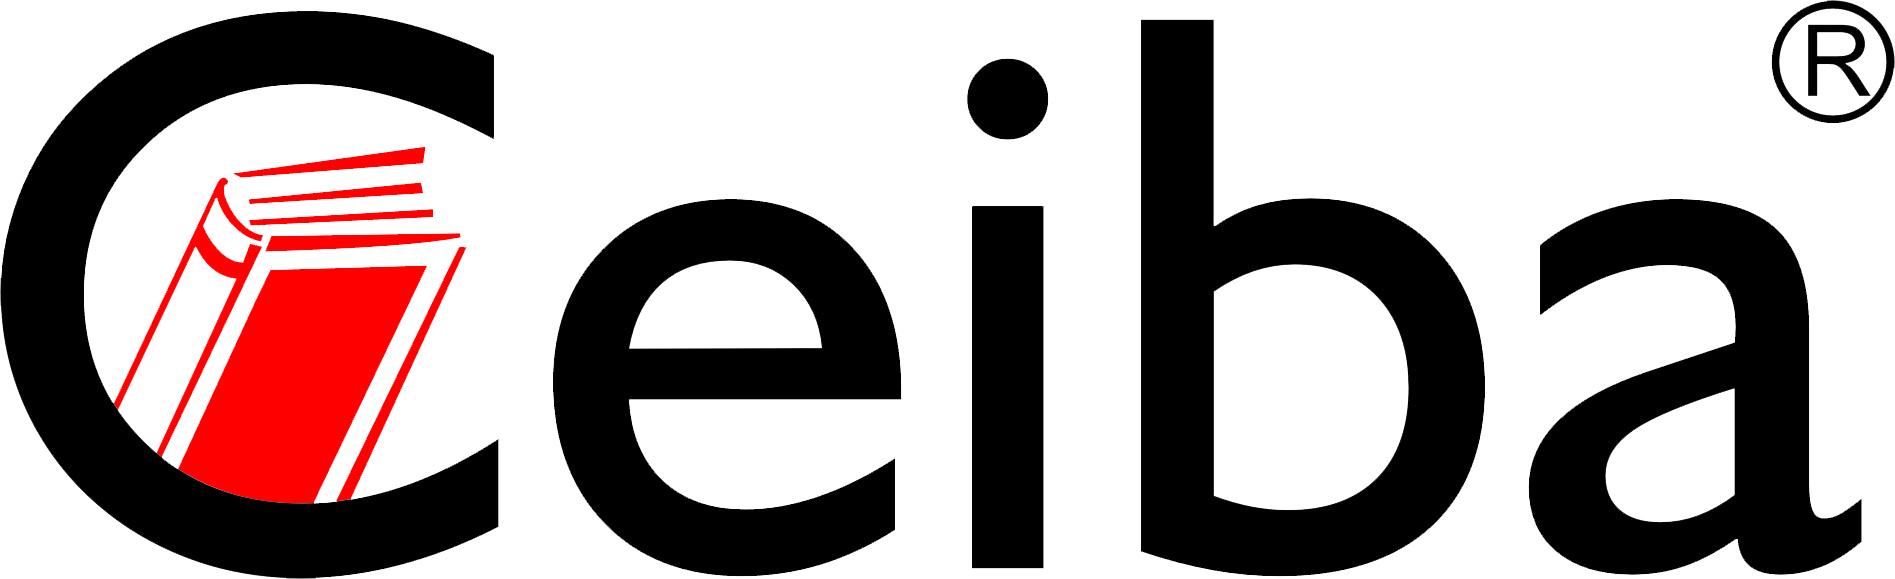 logo-Ceiba-2010.jpg